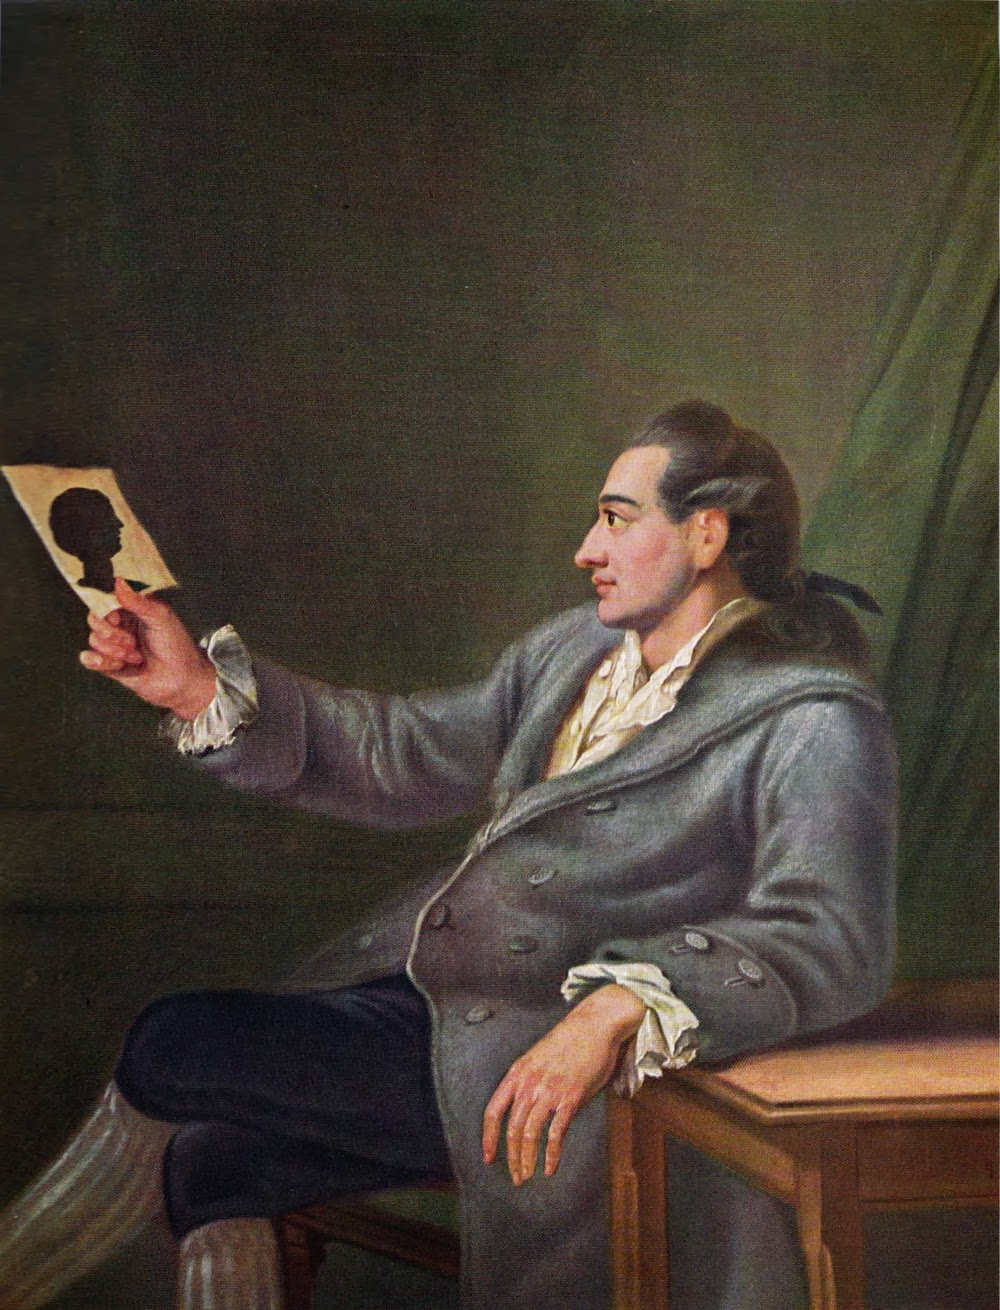 Johann Wolfgang von Goethe by Georg Melchior Kraus (1737-1806)